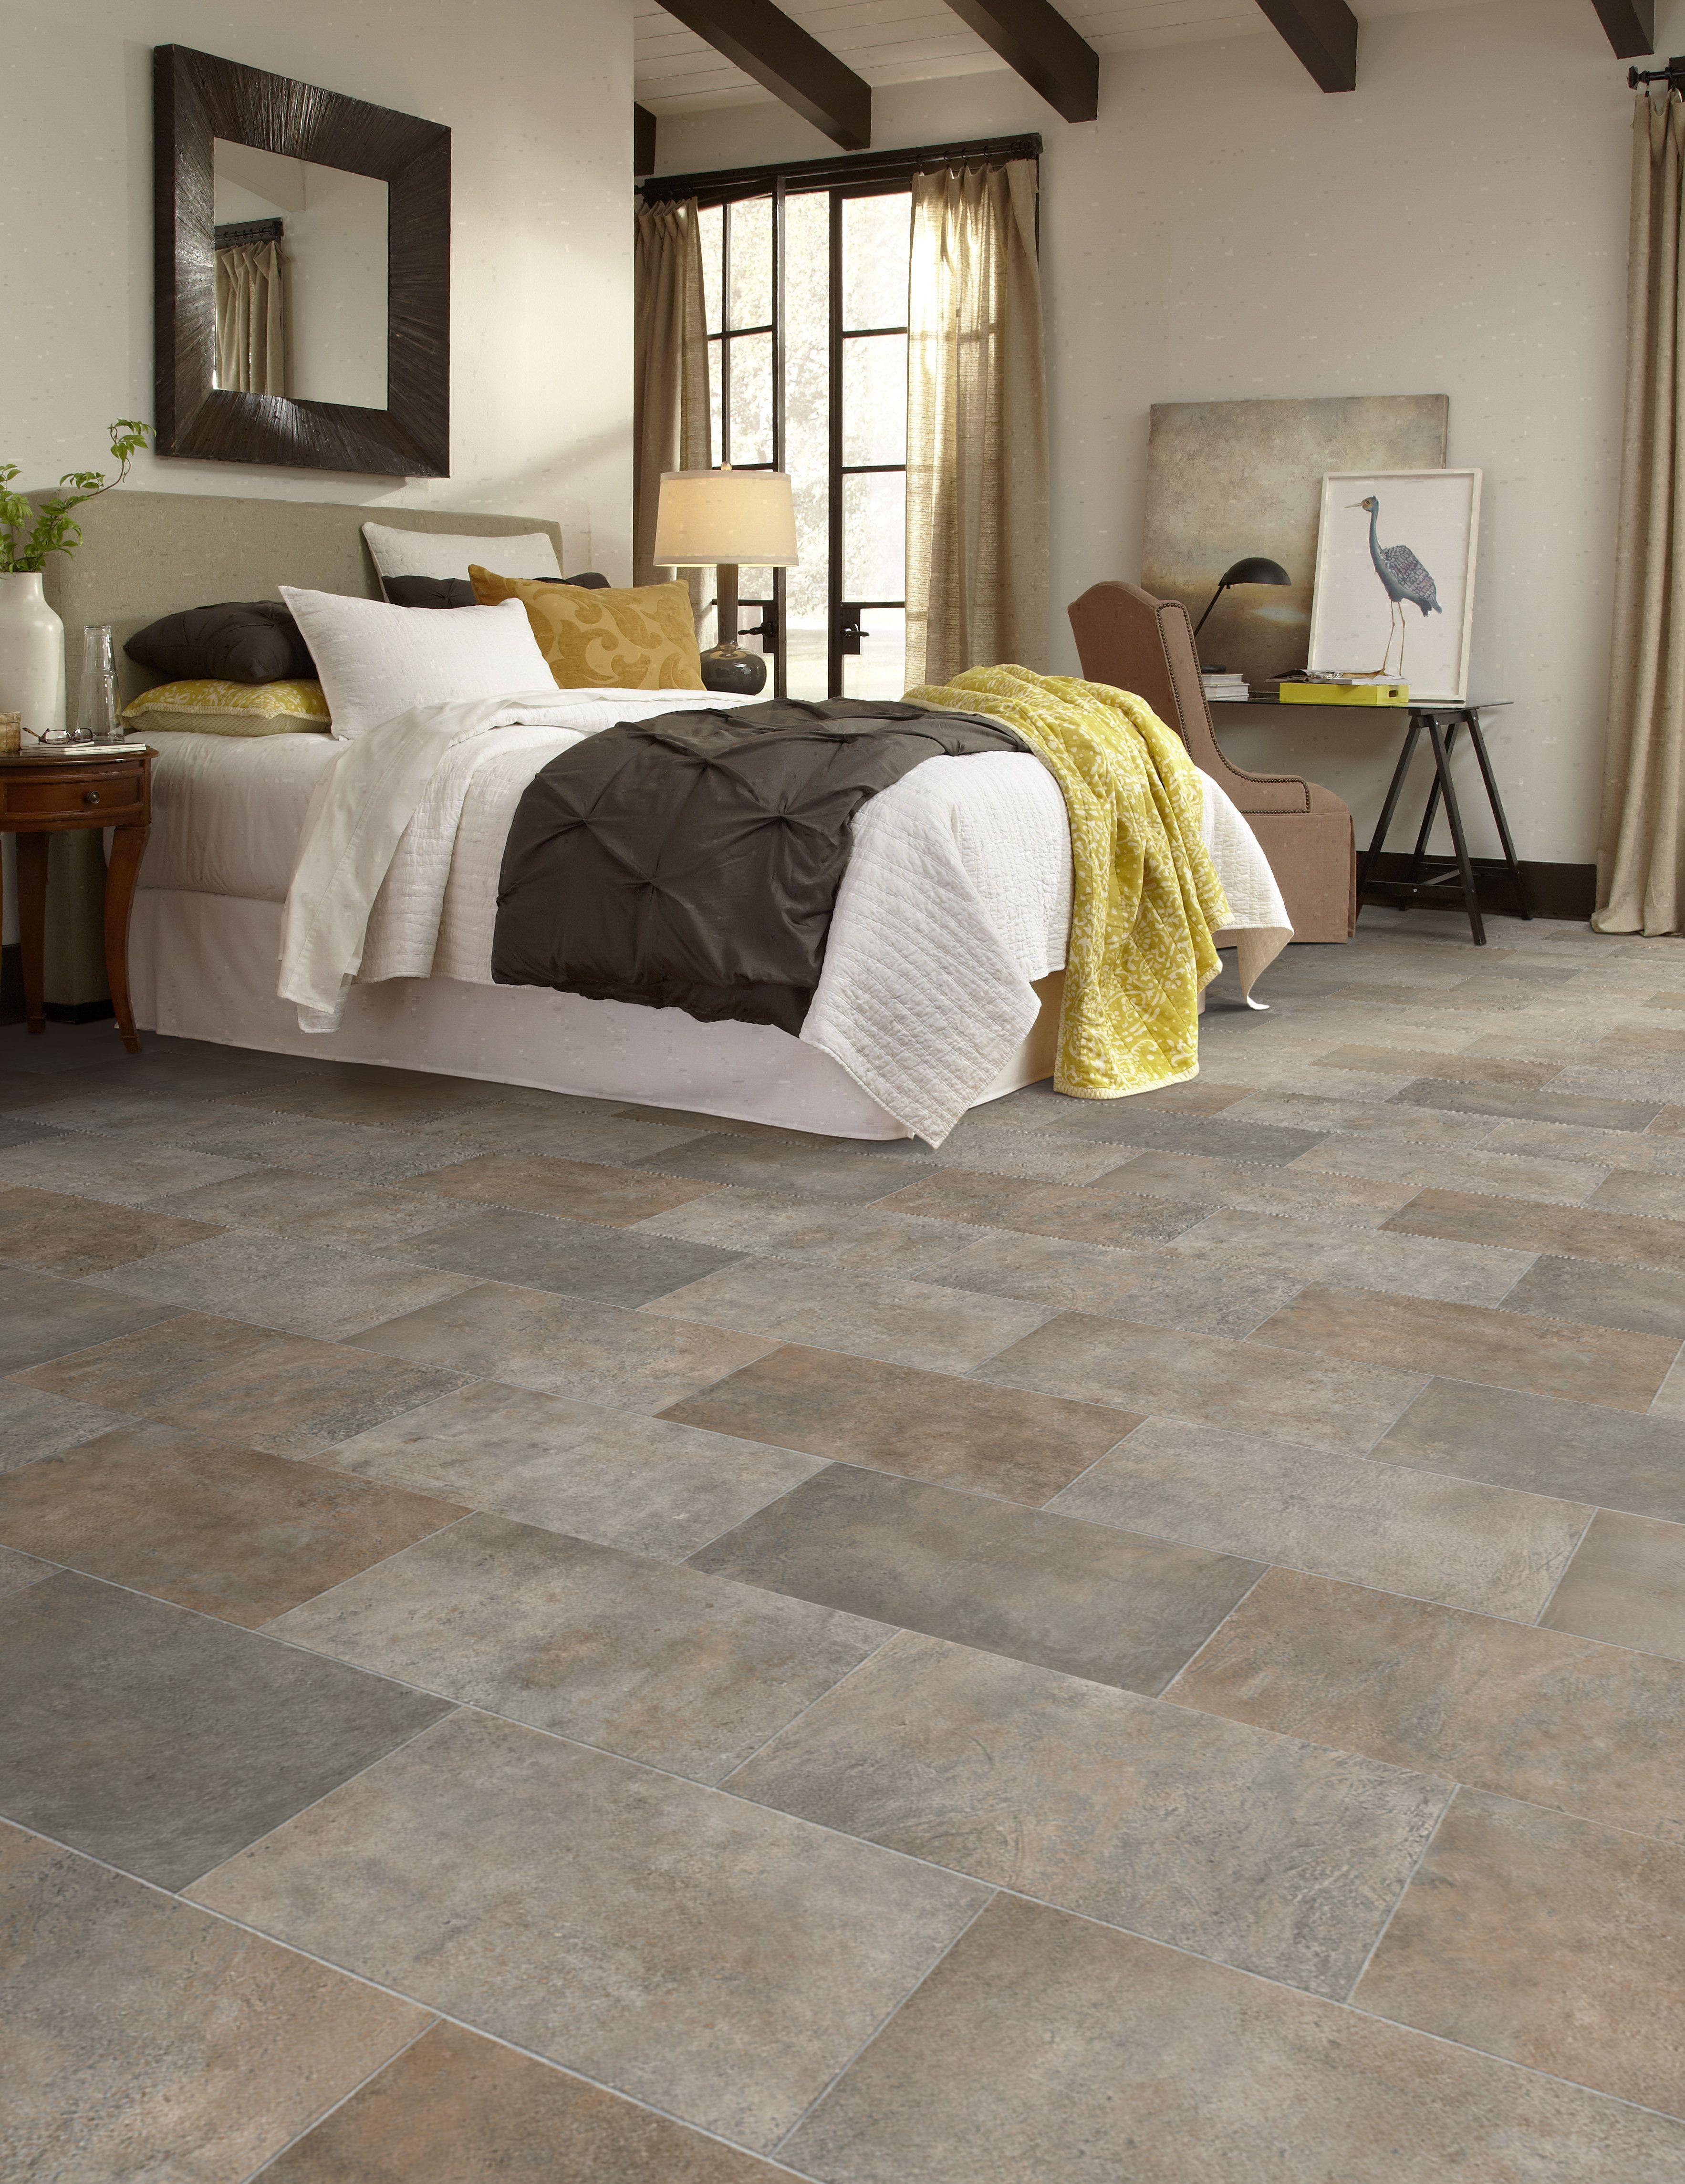 Luxurious Stone Floors Like Our Naturcor Branford 93 Beautifully